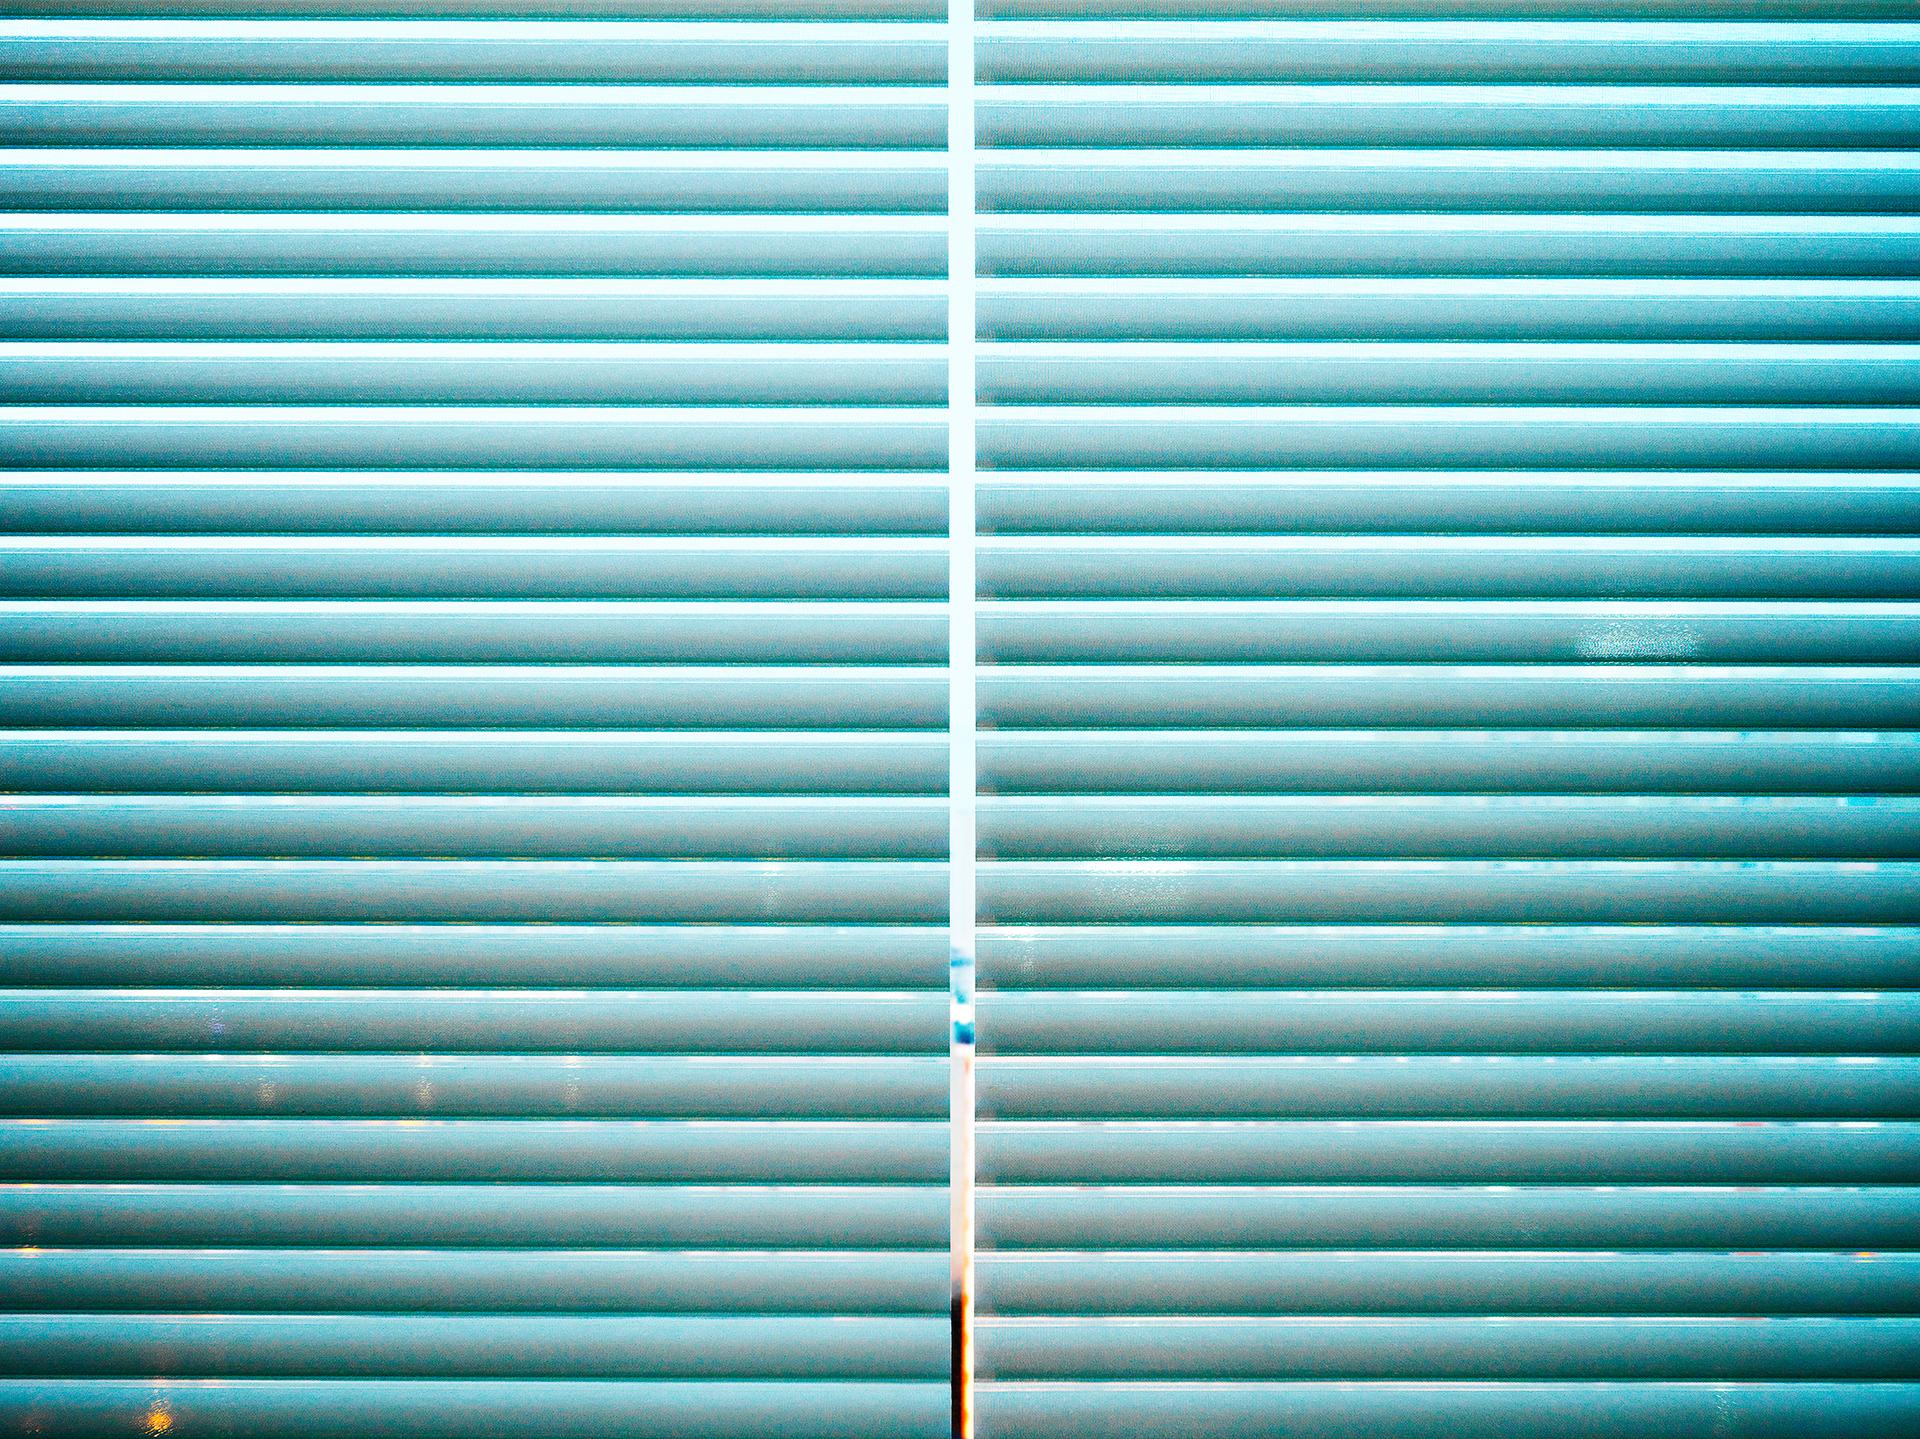 Light Flow : lf, Pn-82   pigment print, diasec, framed  110 x 147cm, 2016